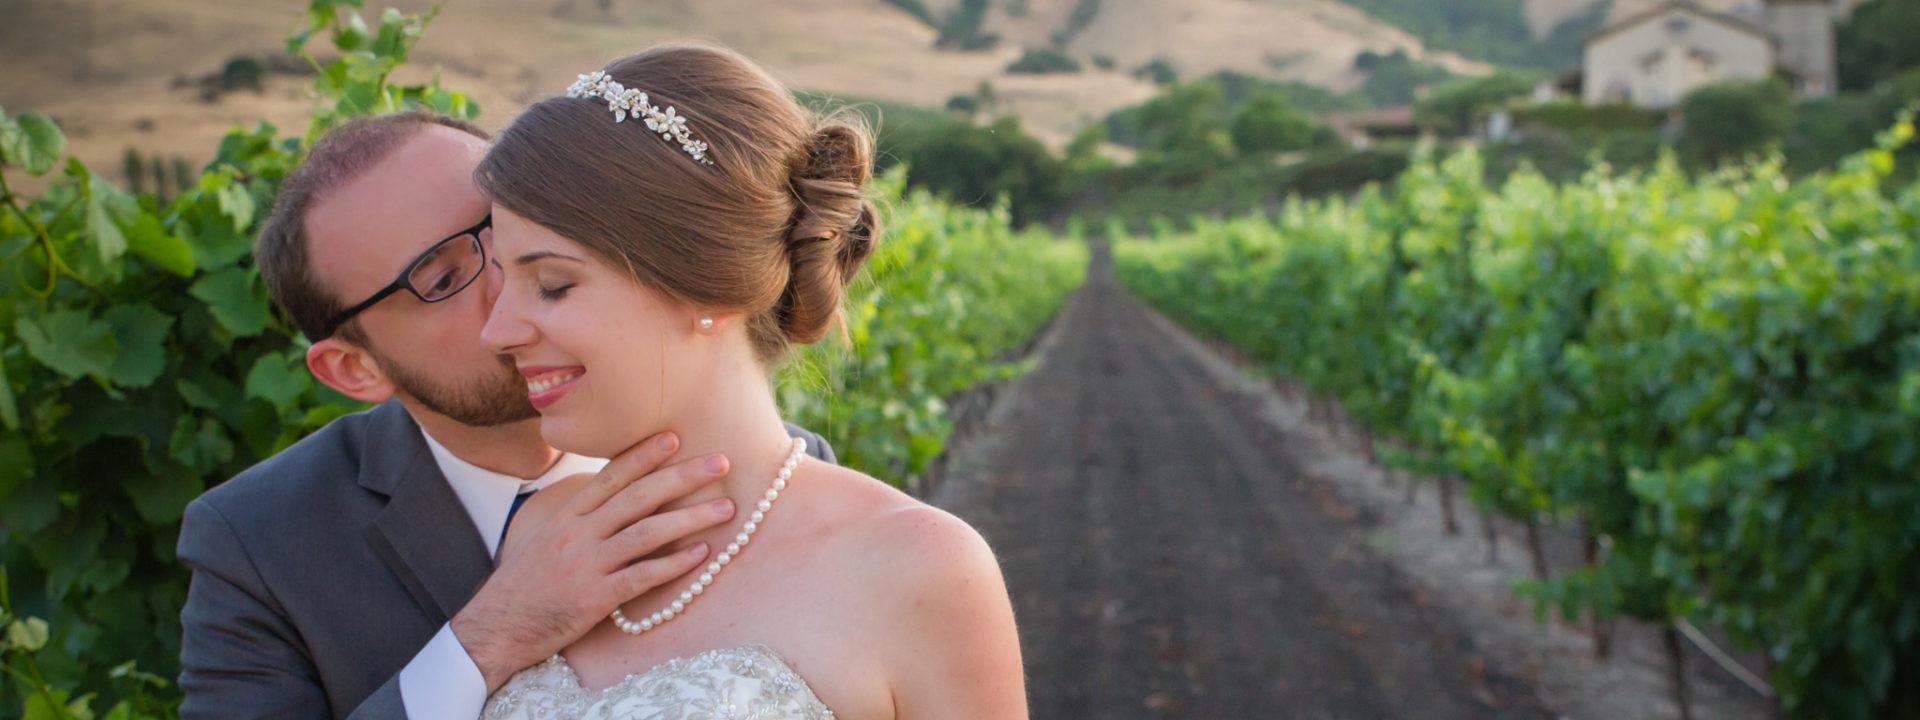 Selecting Your Wedding Photographer